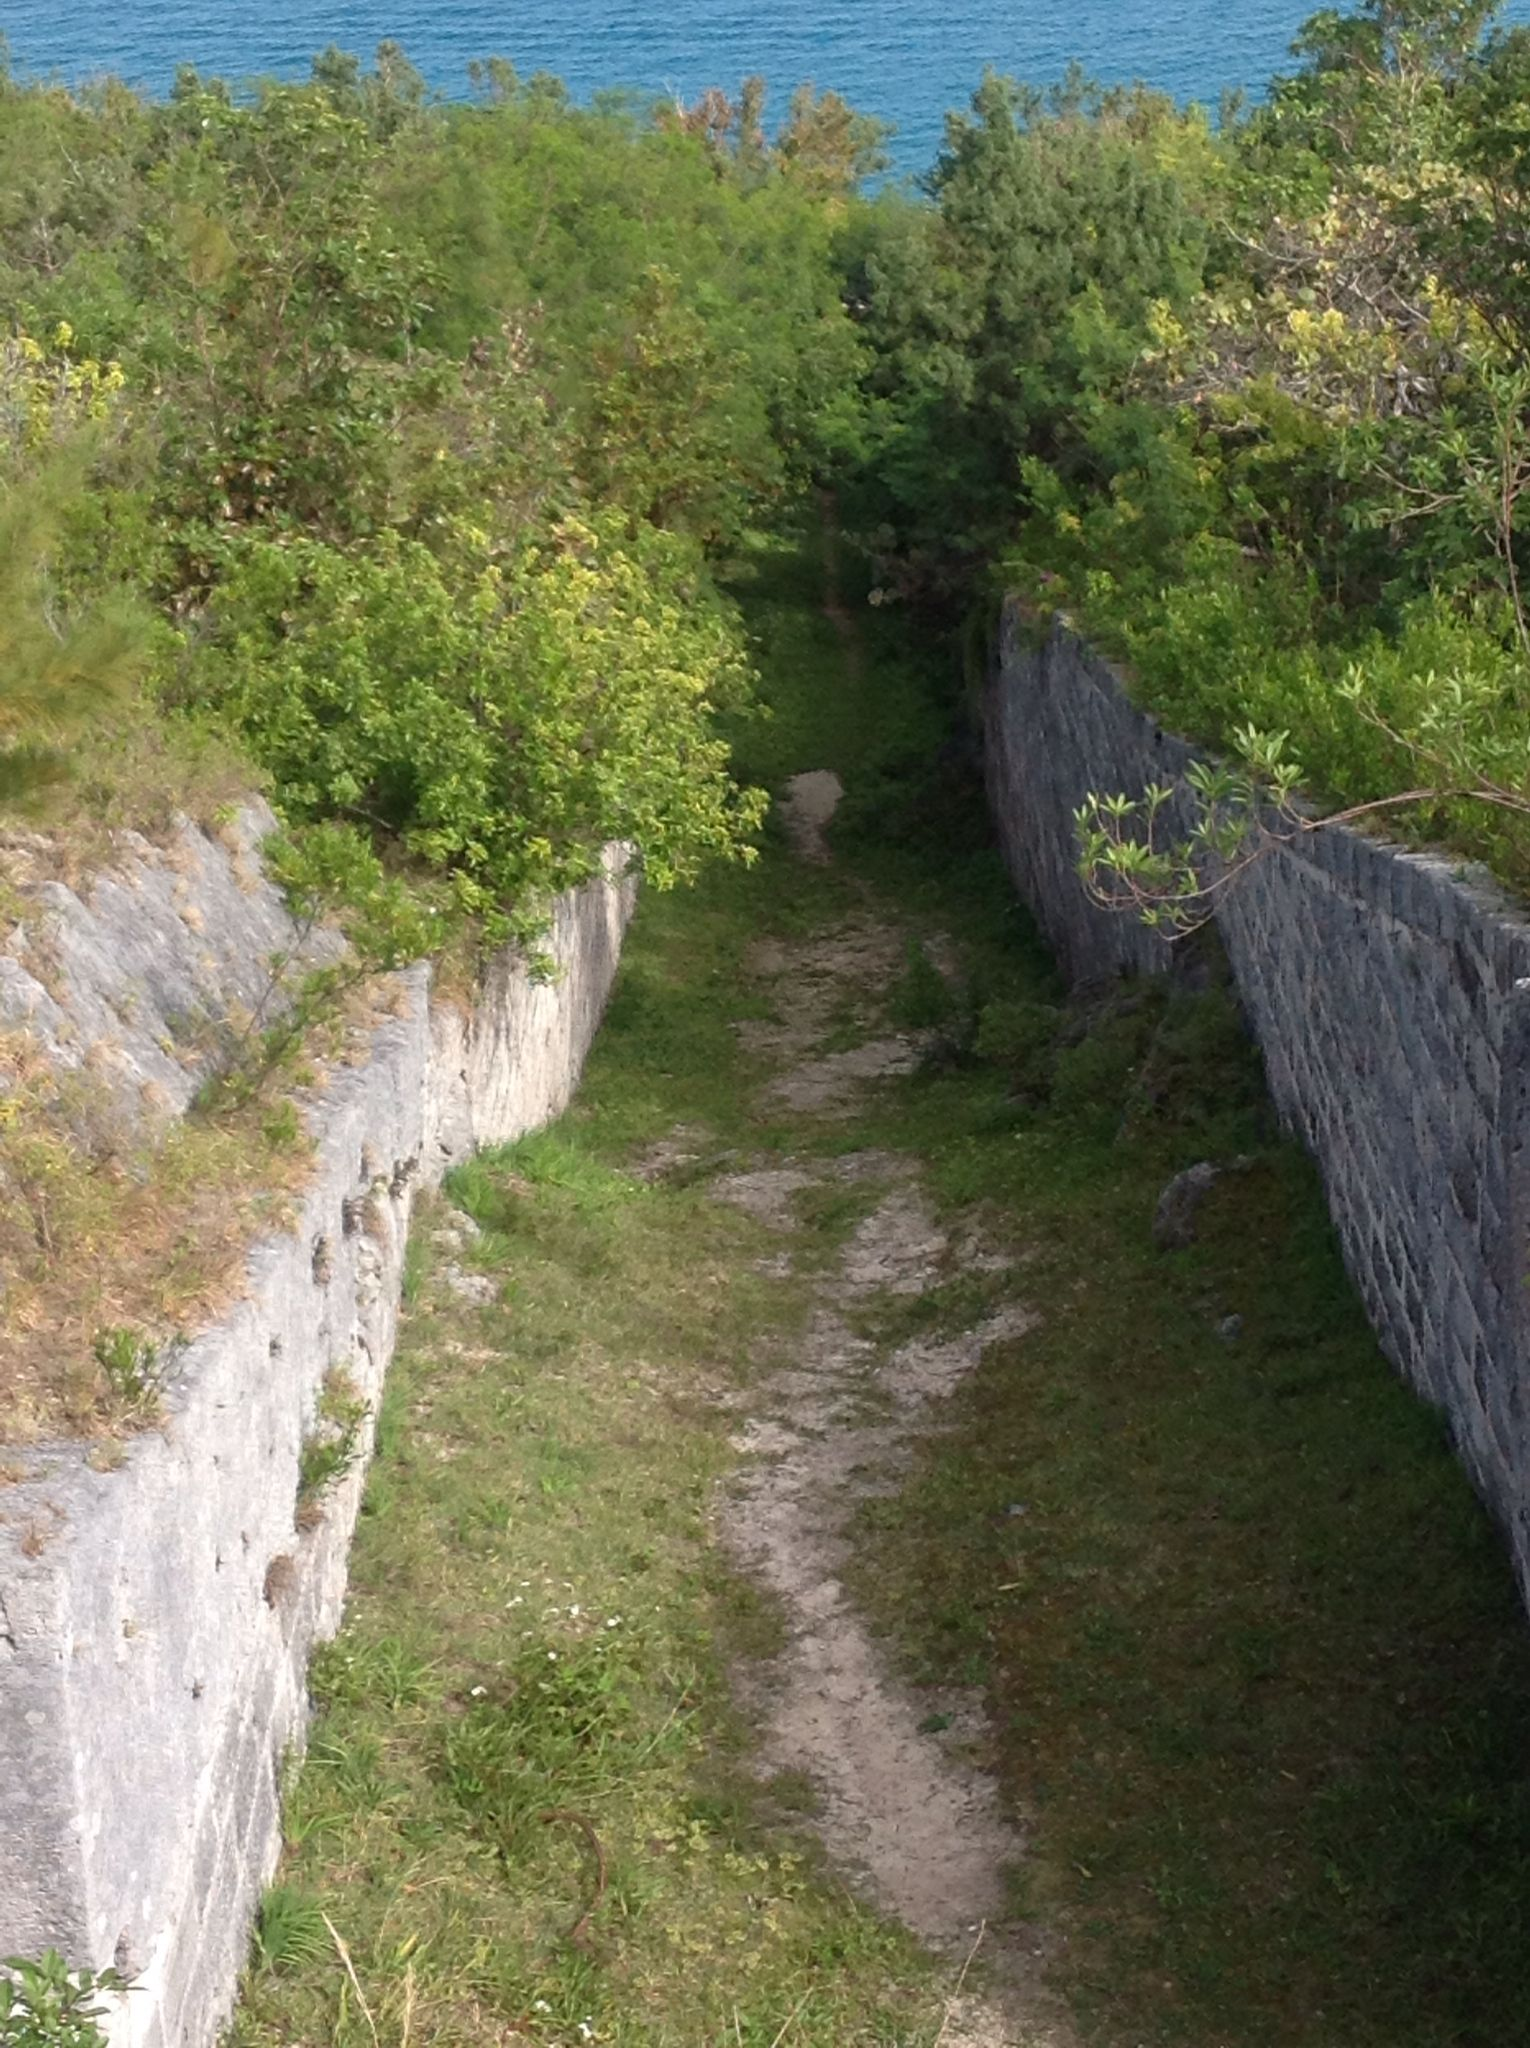 Mawellshaunonpintrest. Mote at Fort Scaur, Sandys, Bermuda